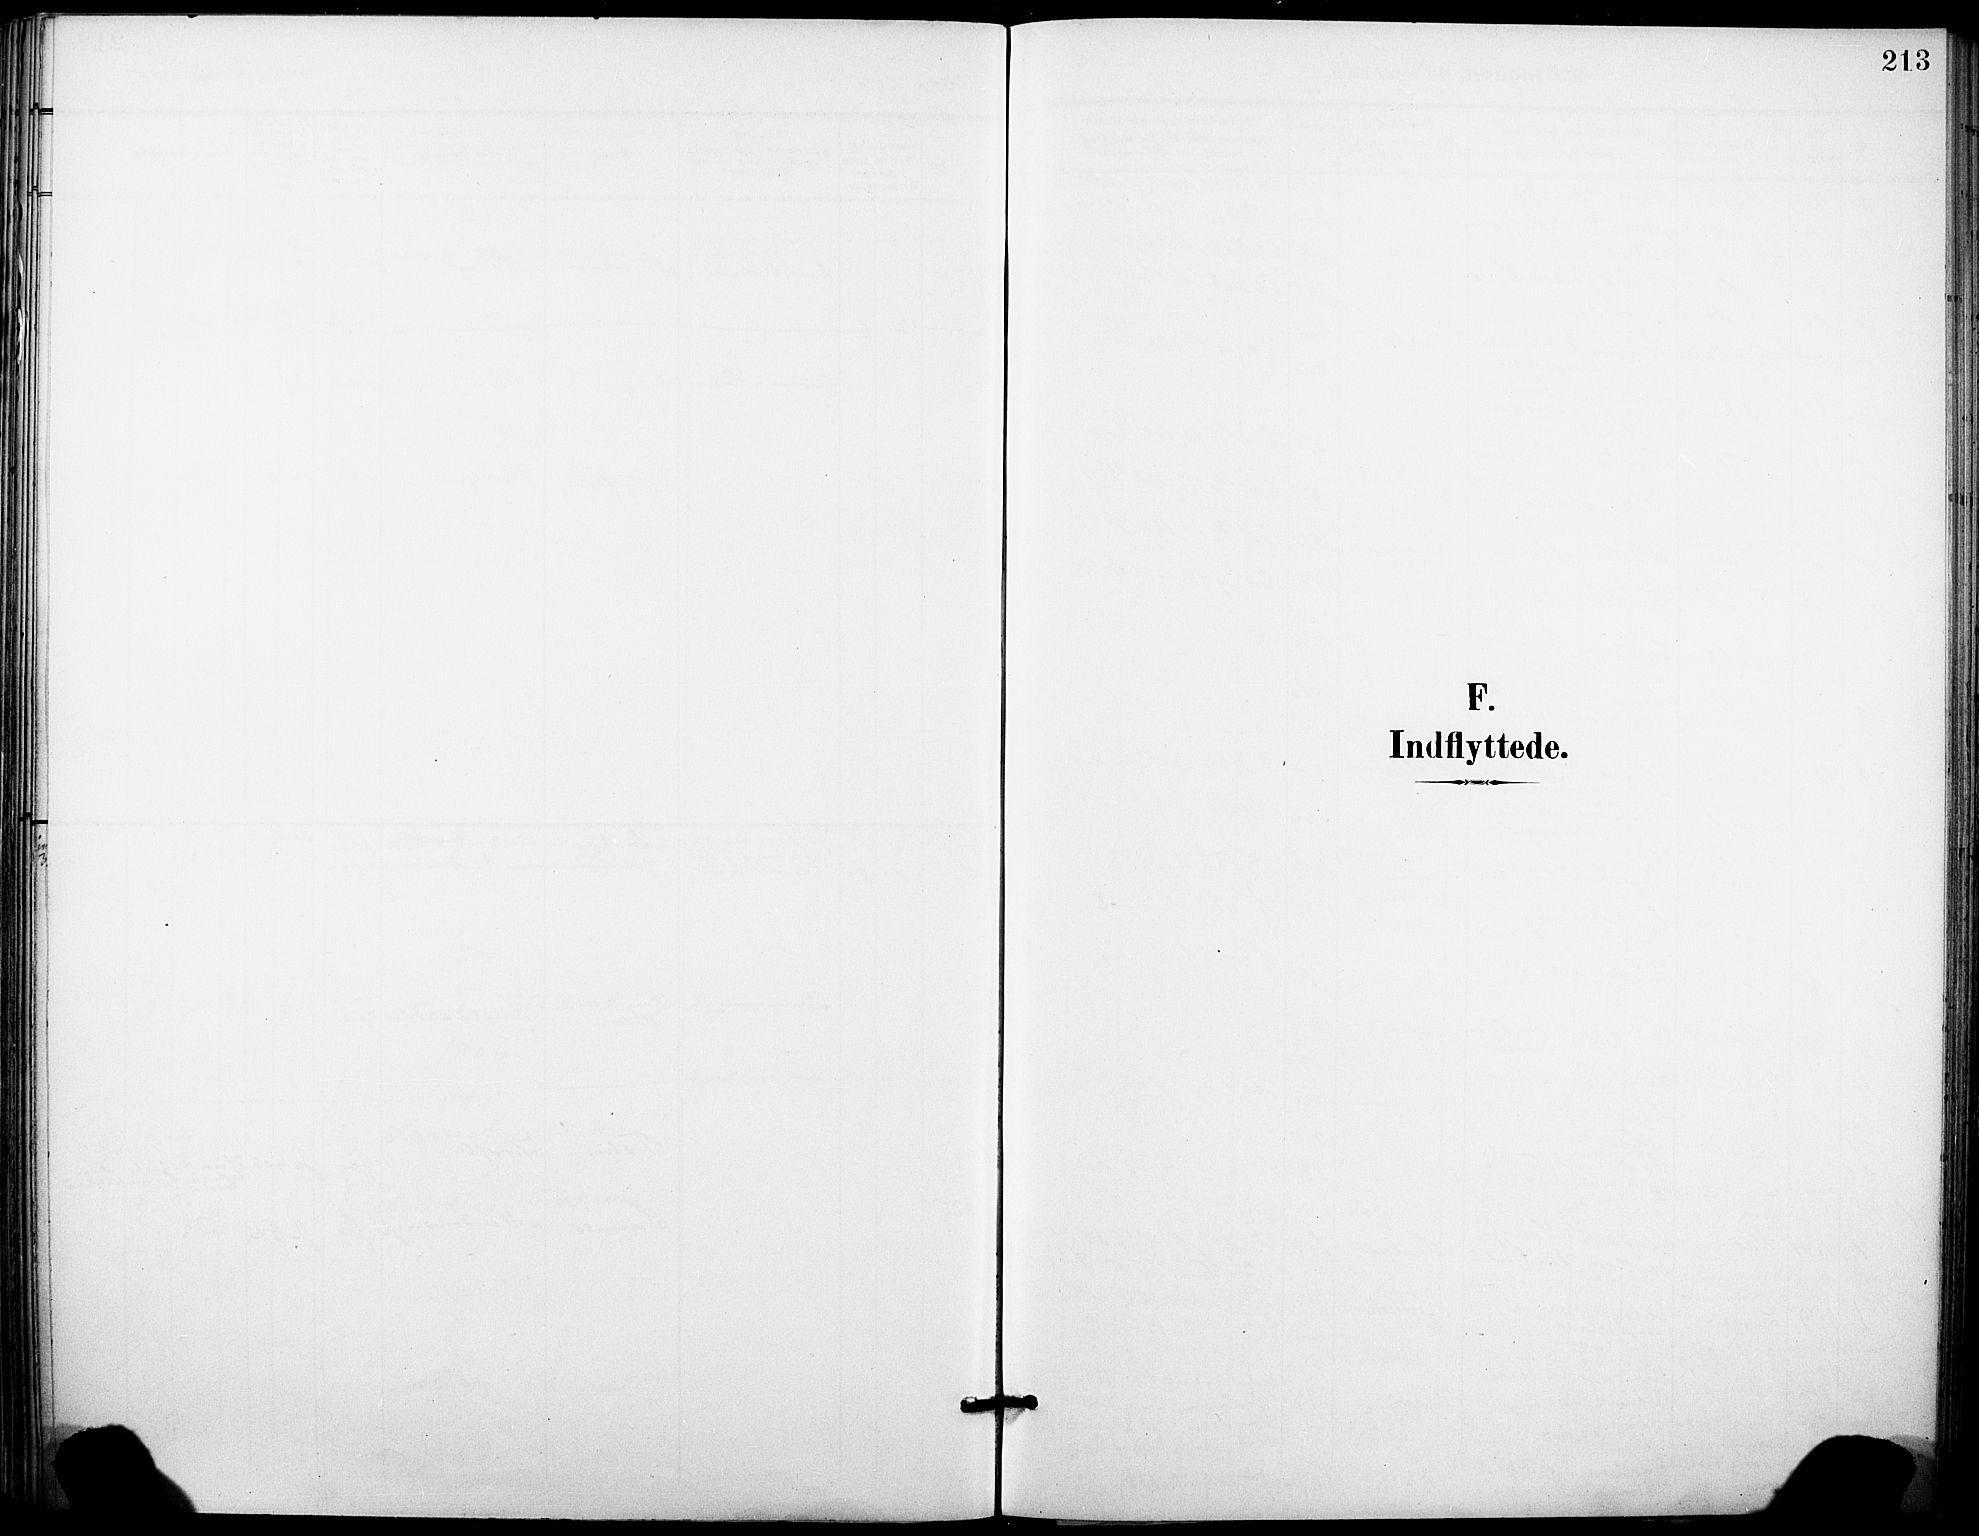 SAKO, Holla kirkebøker, F/Fa/L0010: Ministerialbok nr. 10, 1897-1907, s. 213